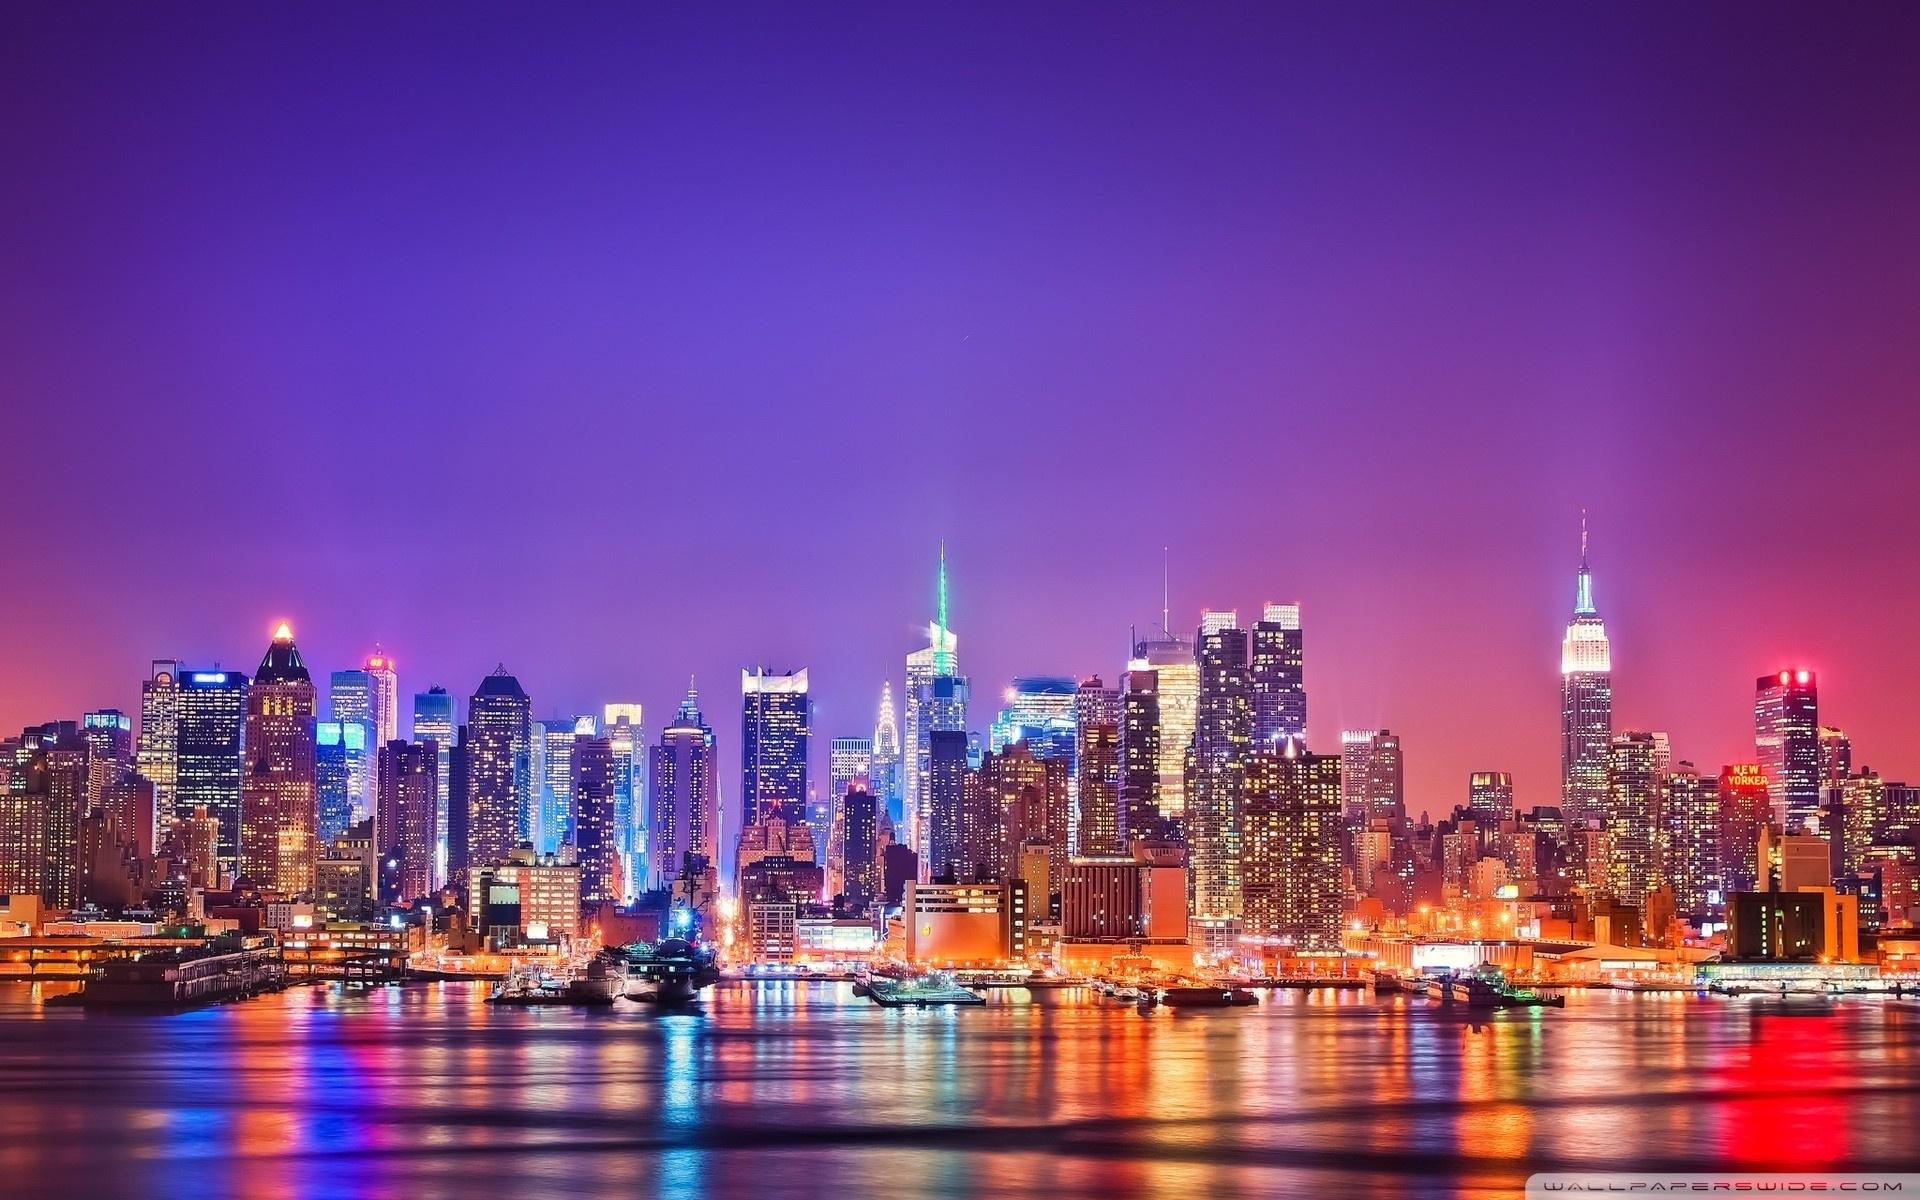 new york city skyline at night ❤ 4k hd desktop wallpaper for 4k